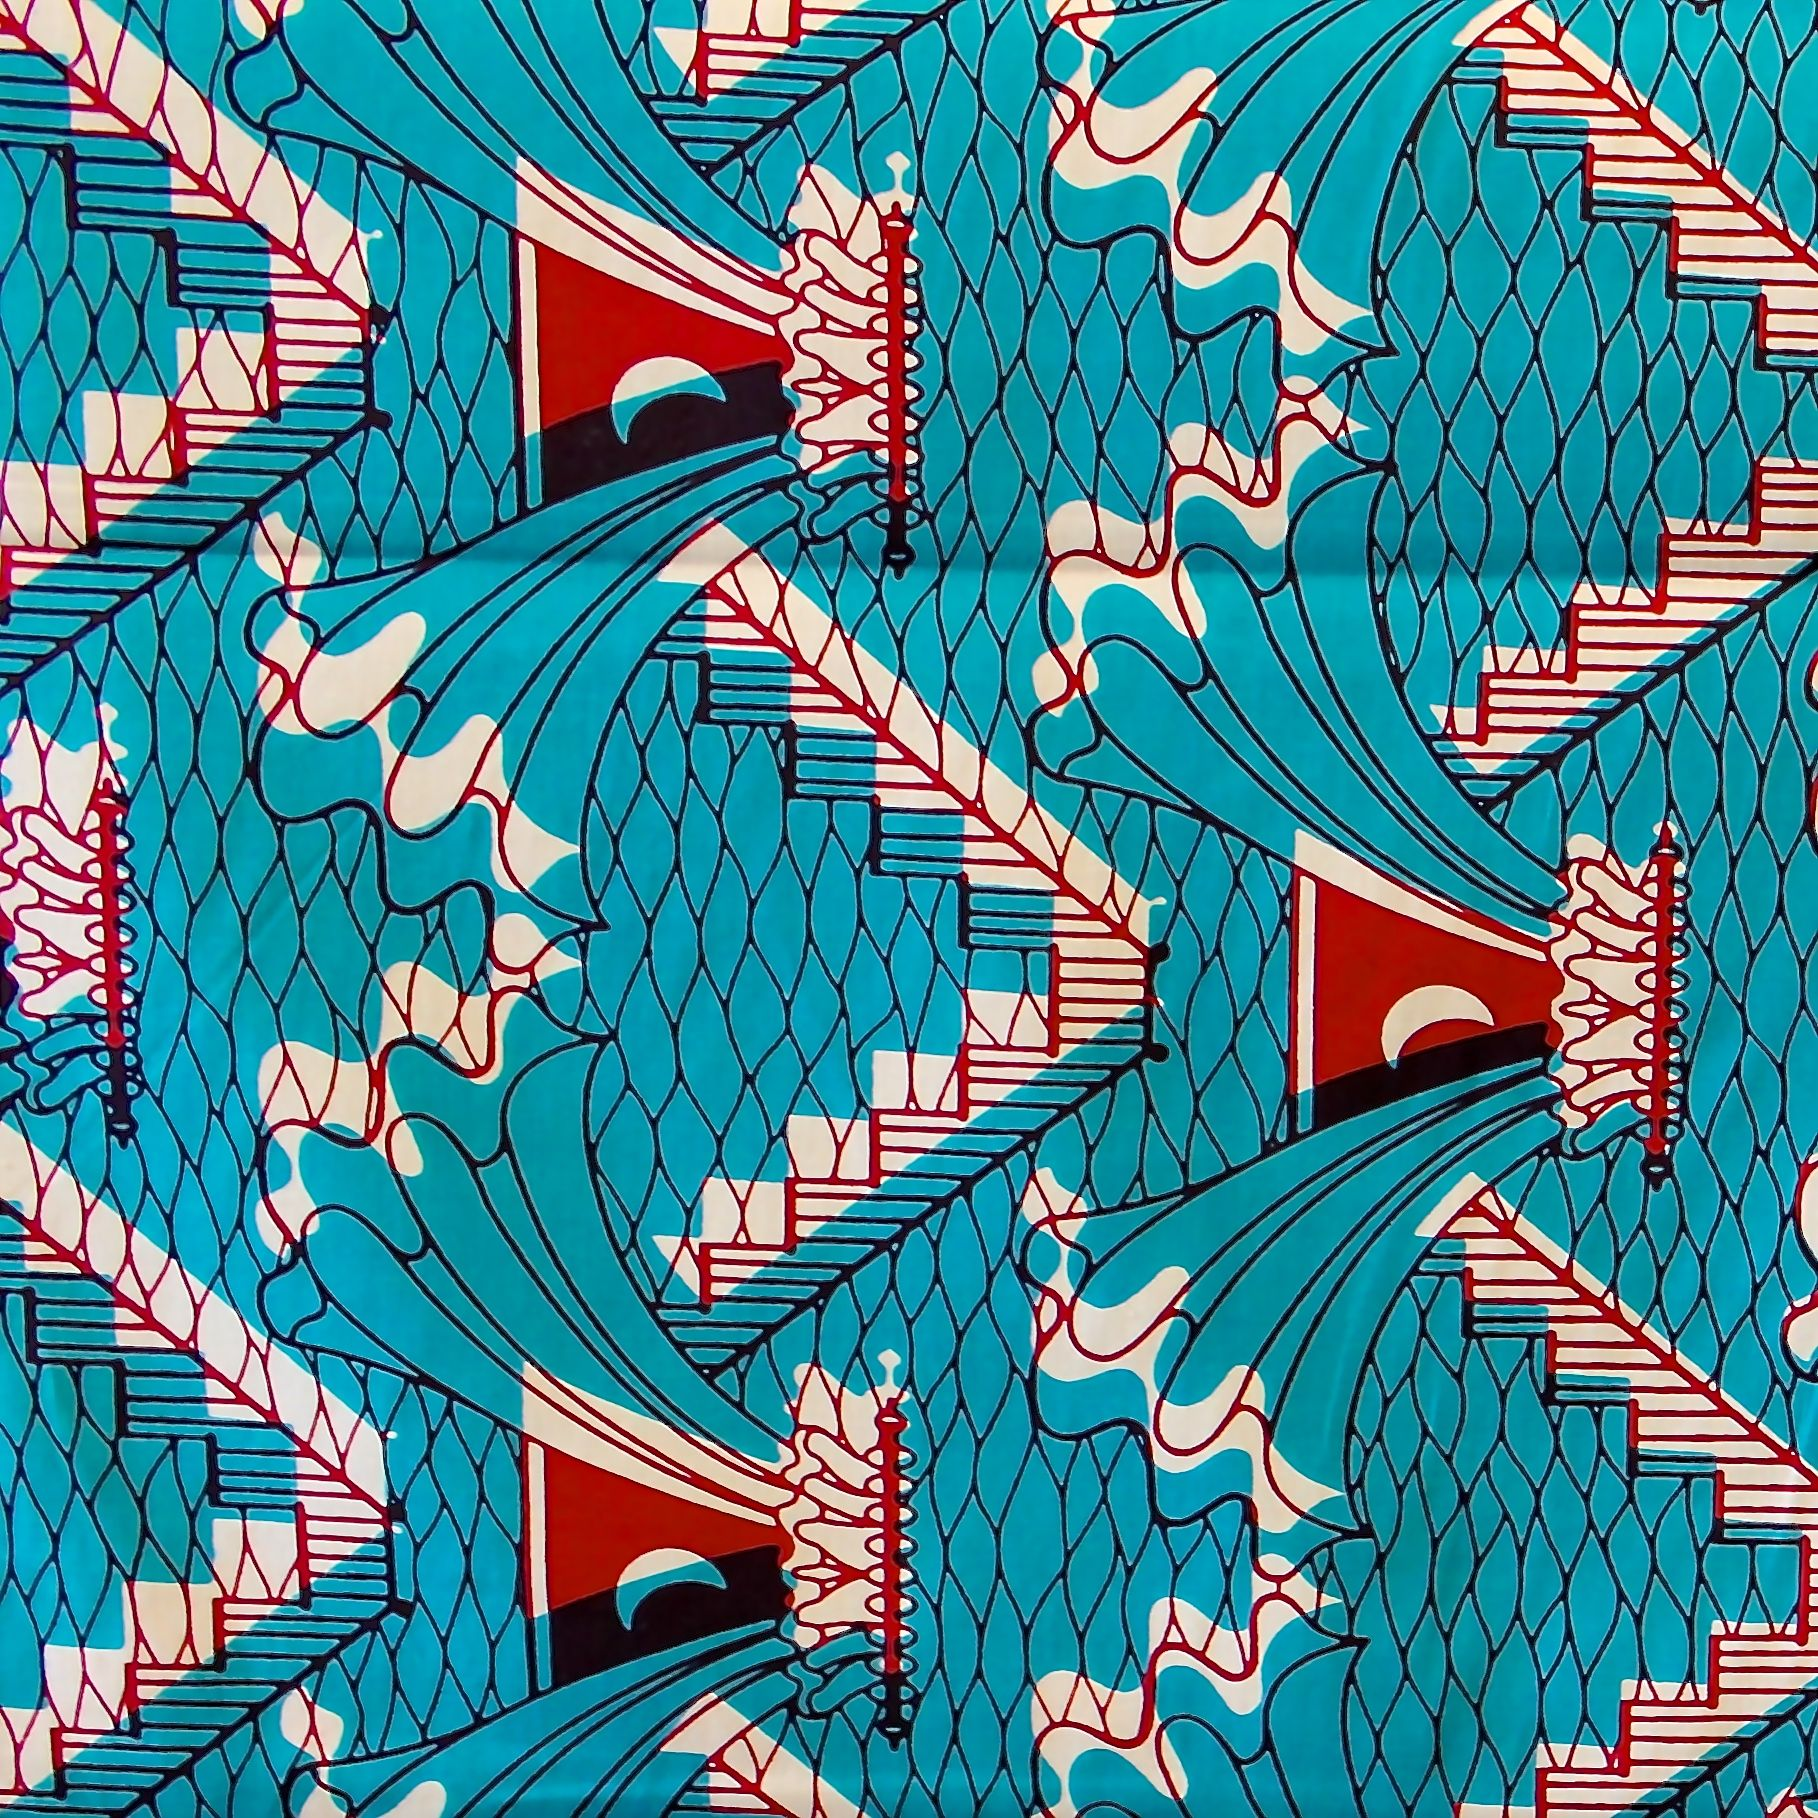 tissu africain bruxelles